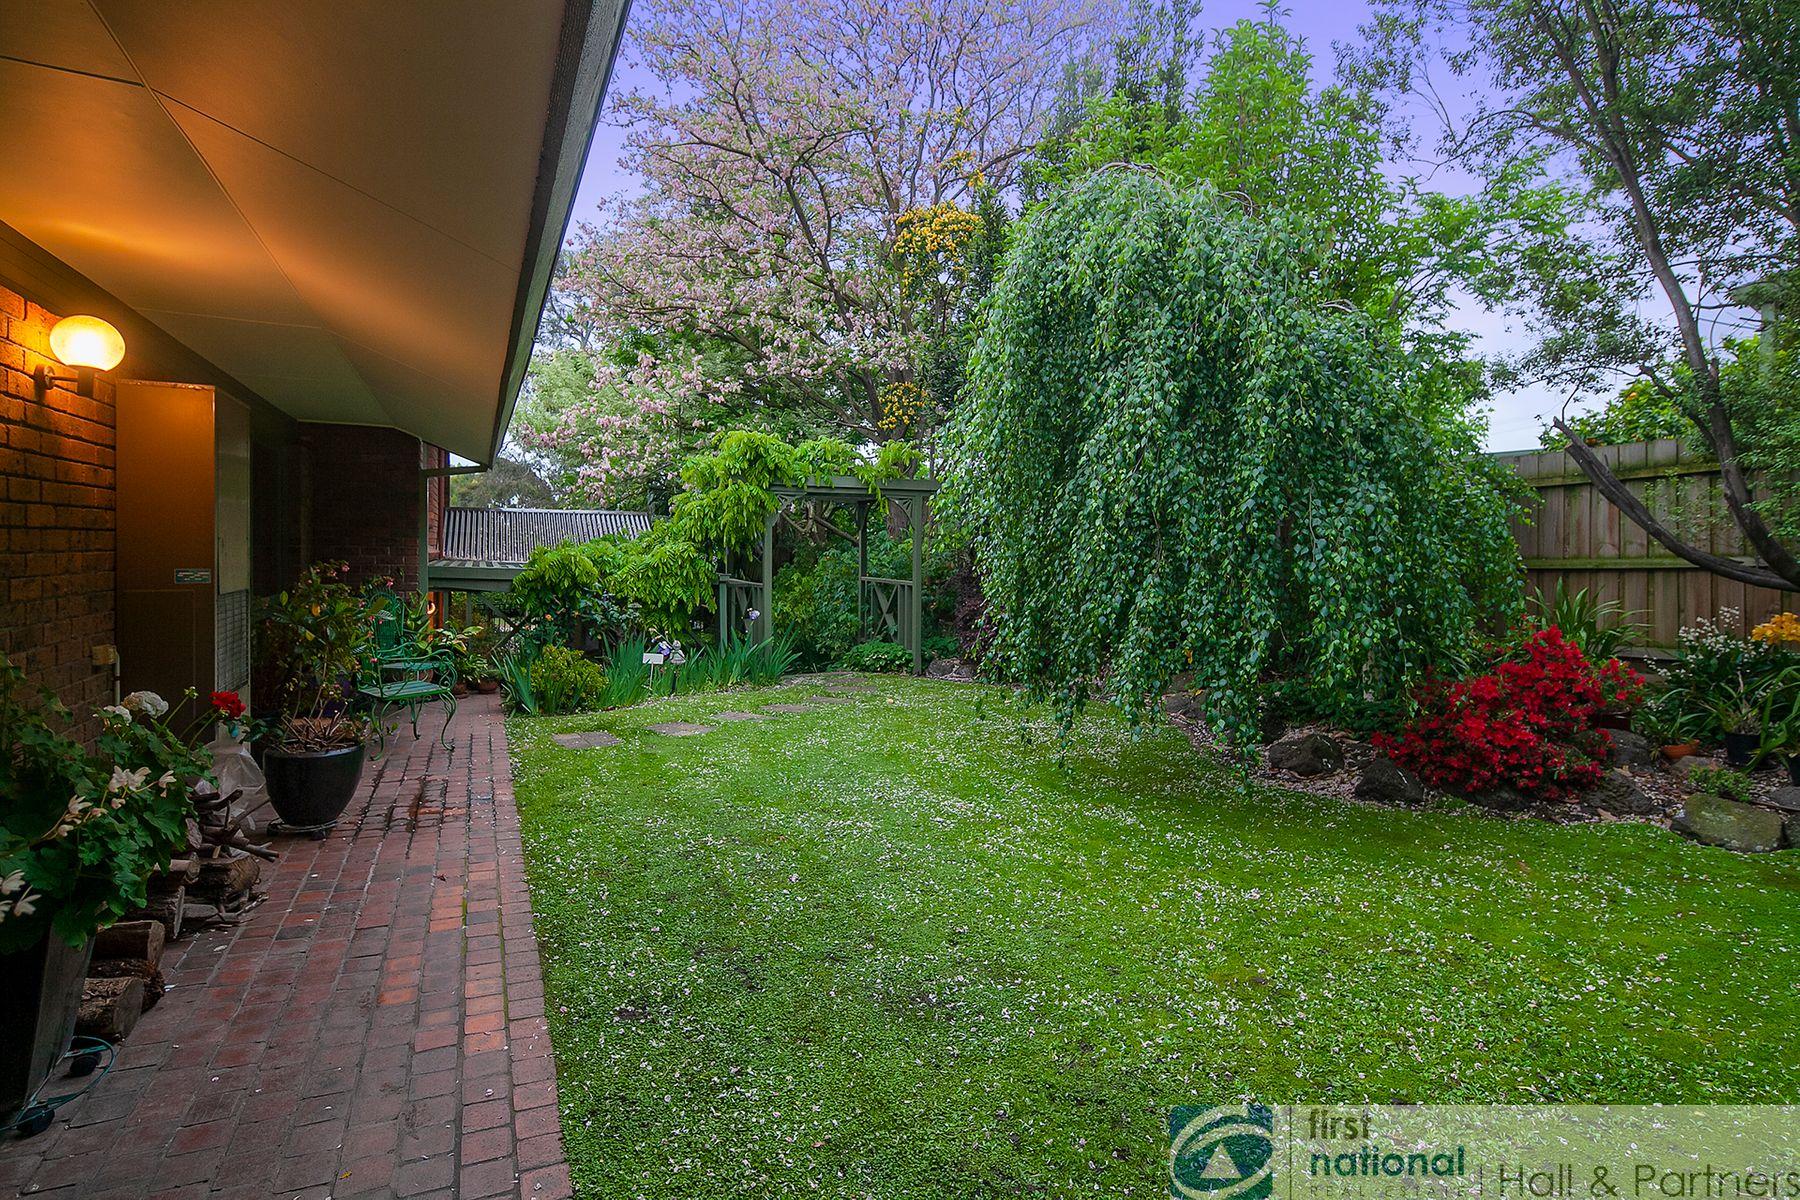 82 & 84 Langhorne Street, Dandenong, VIC 3175